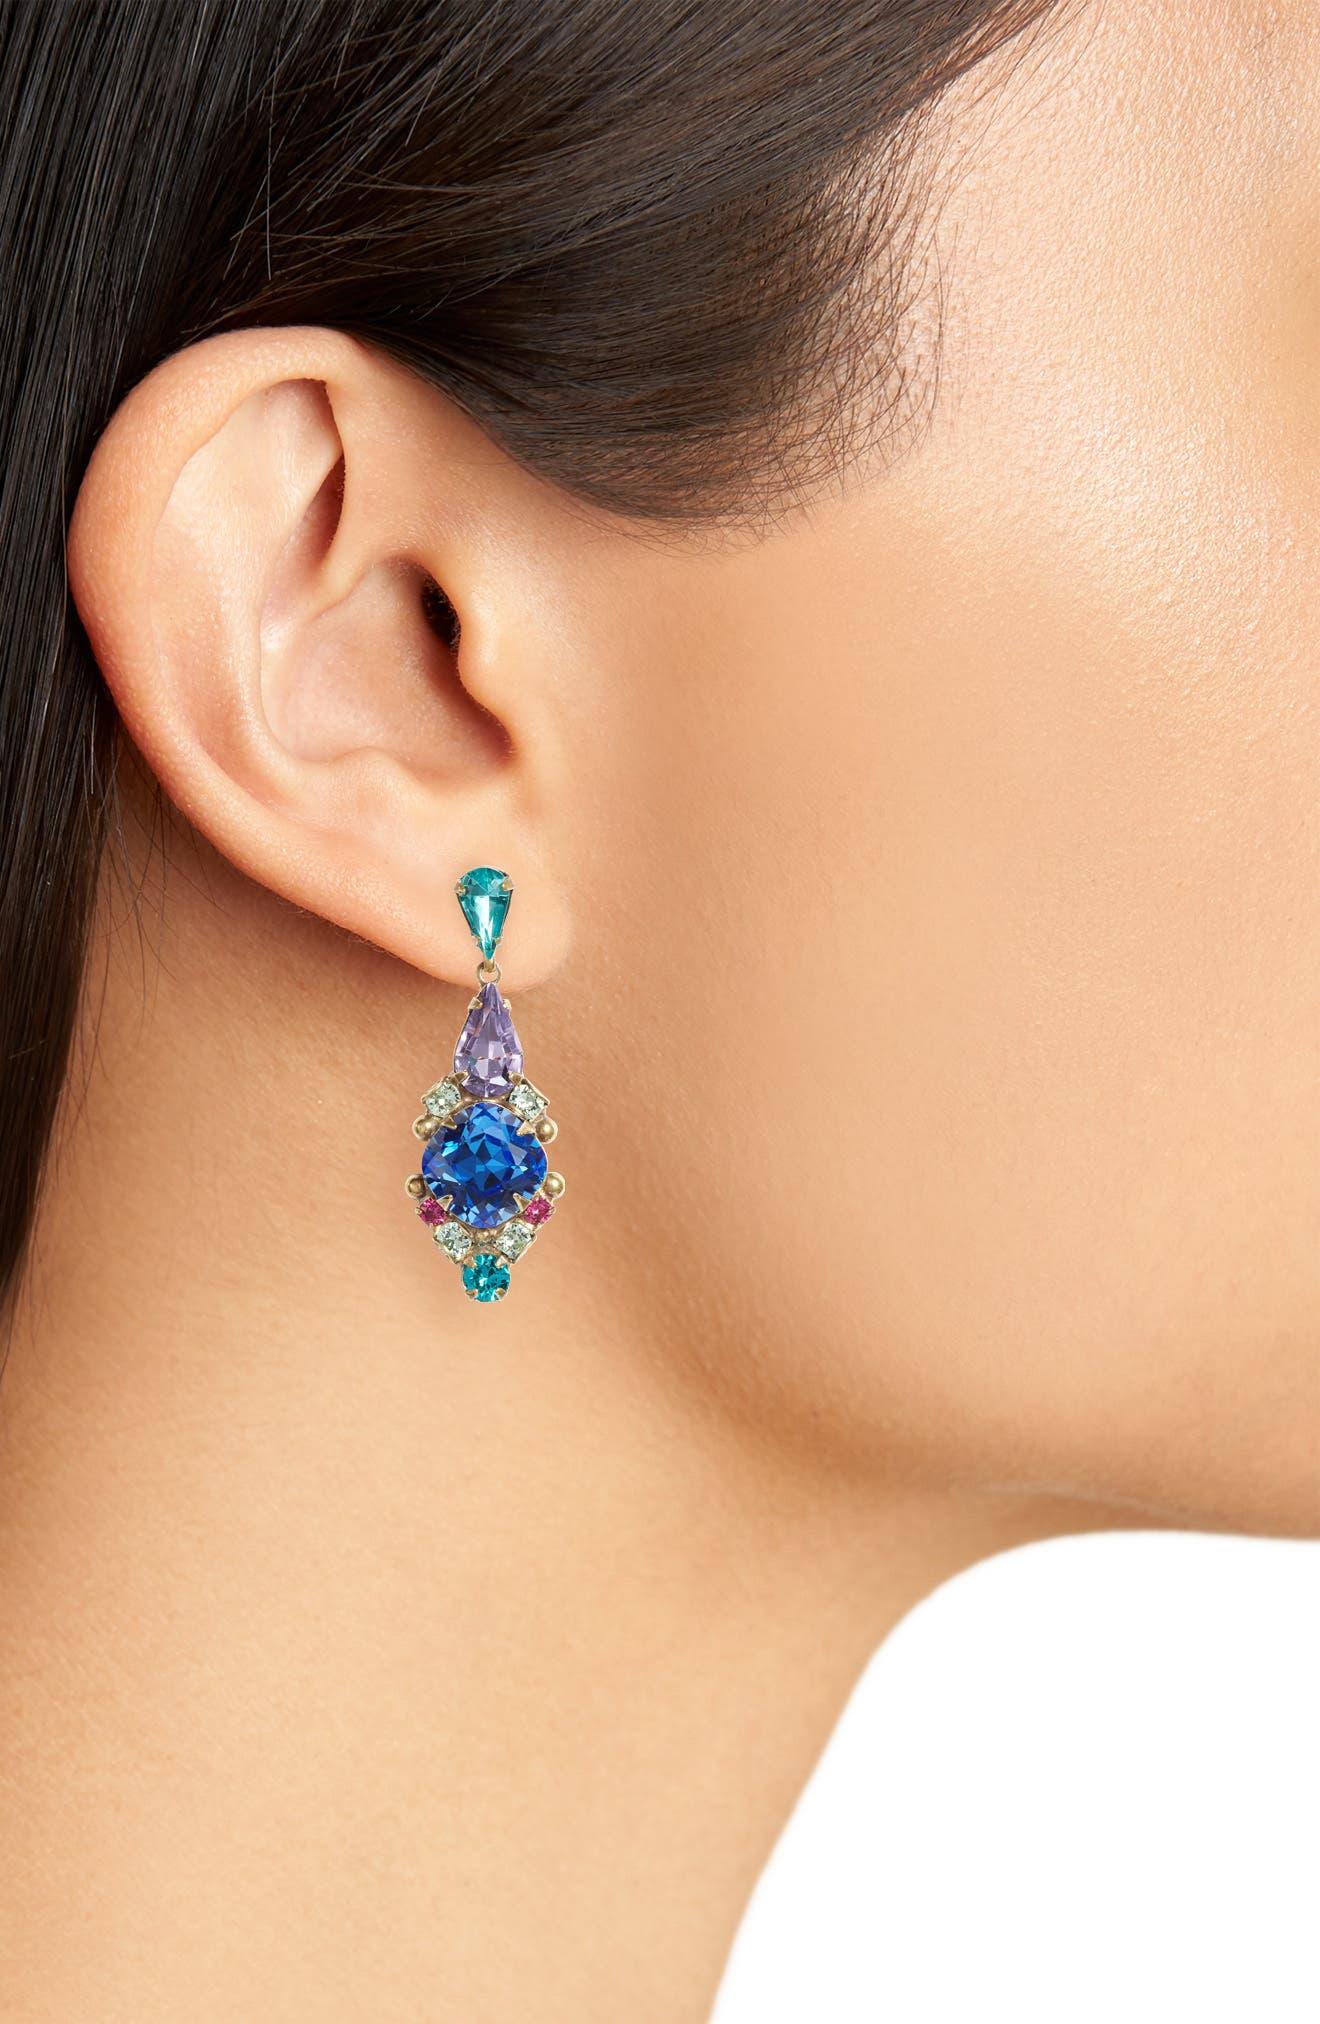 Alyssum Earrings,                             Alternate thumbnail 2, color,                             BLUE MULTI